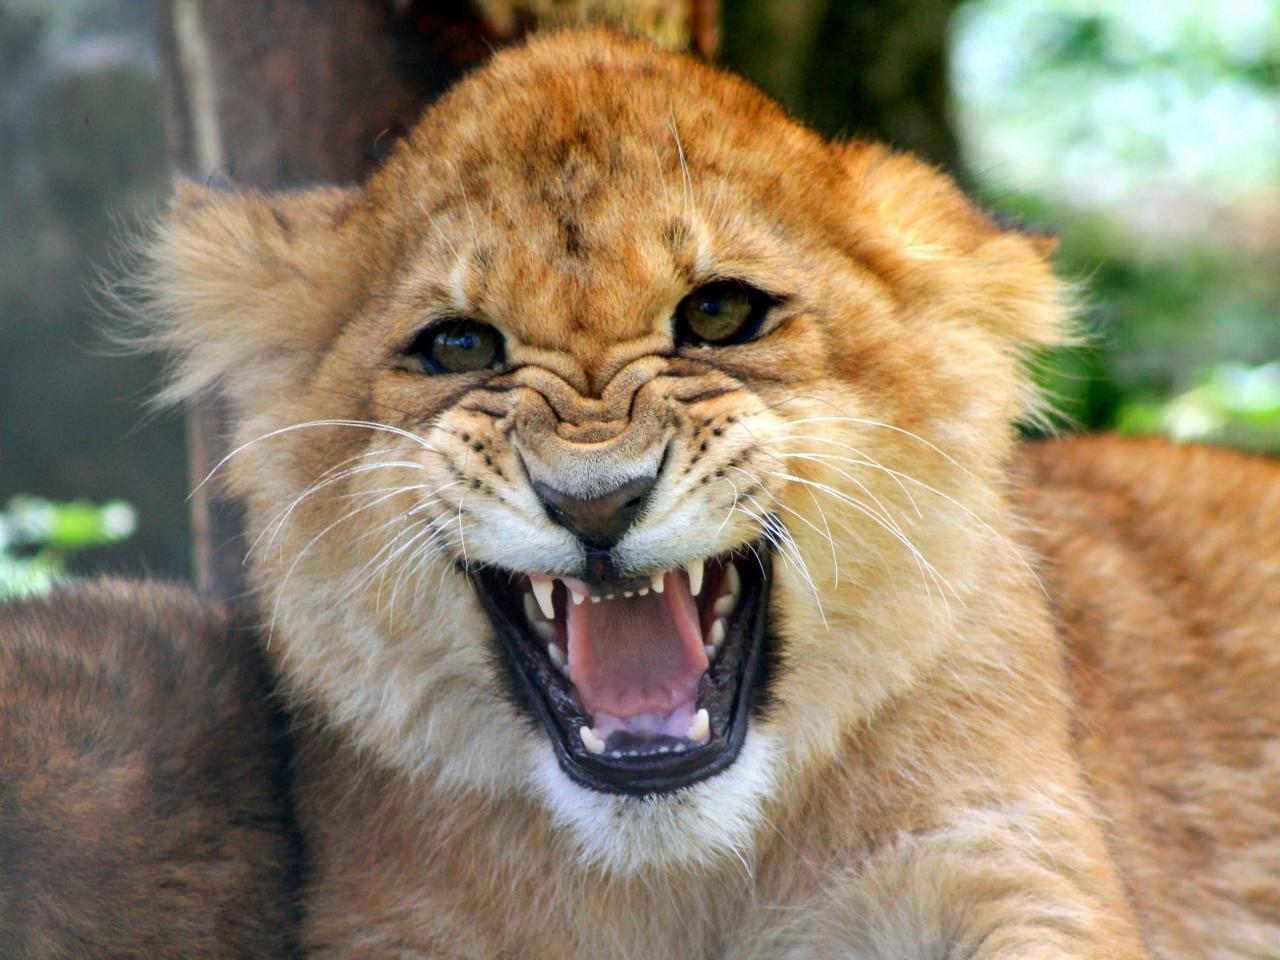 Cachorro león rugiendo - 1280x960